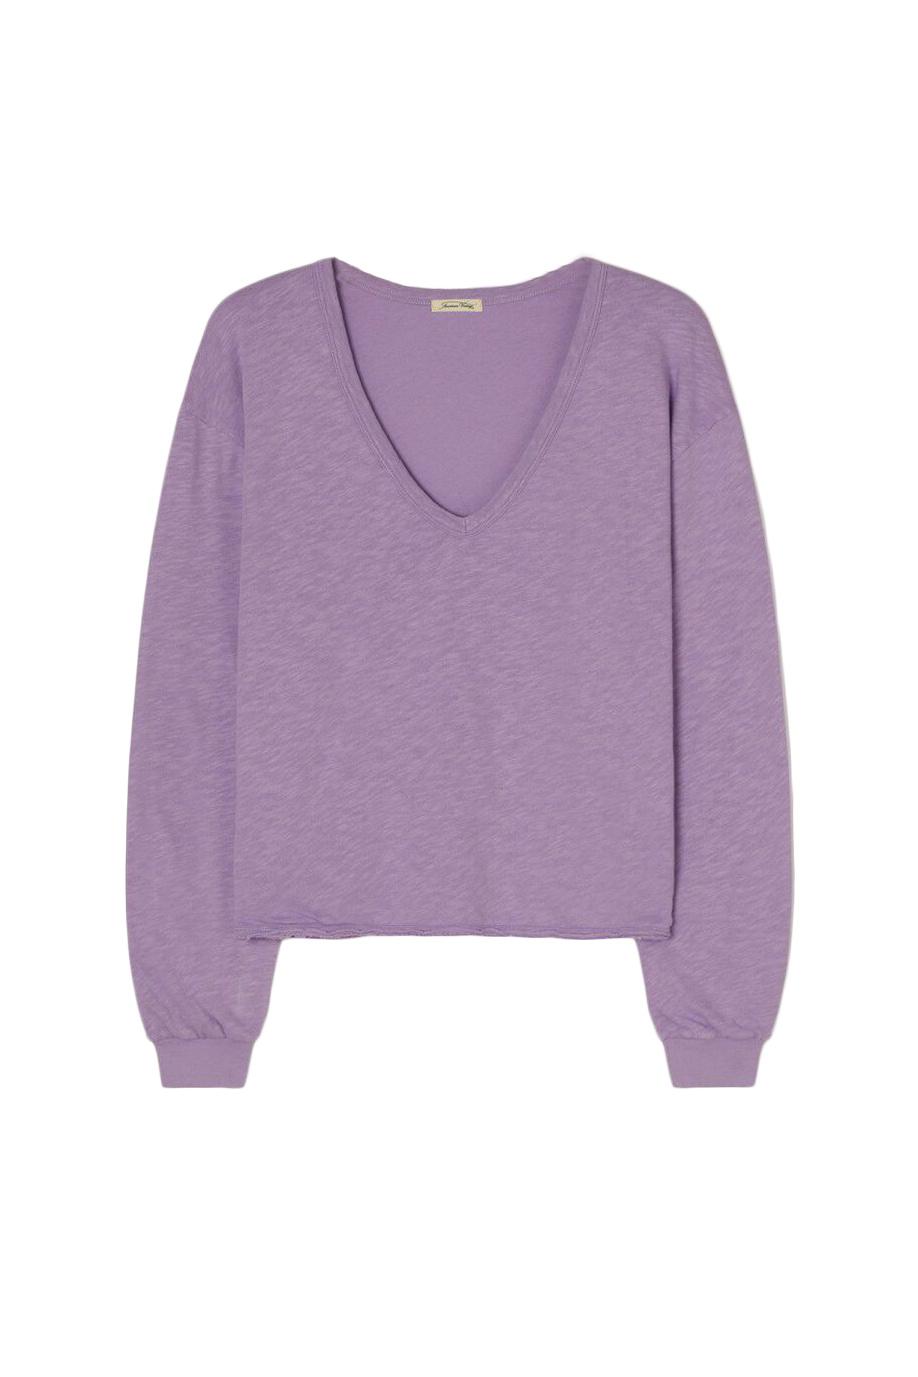 Sonoma Shirt - Mauve Vintage-1